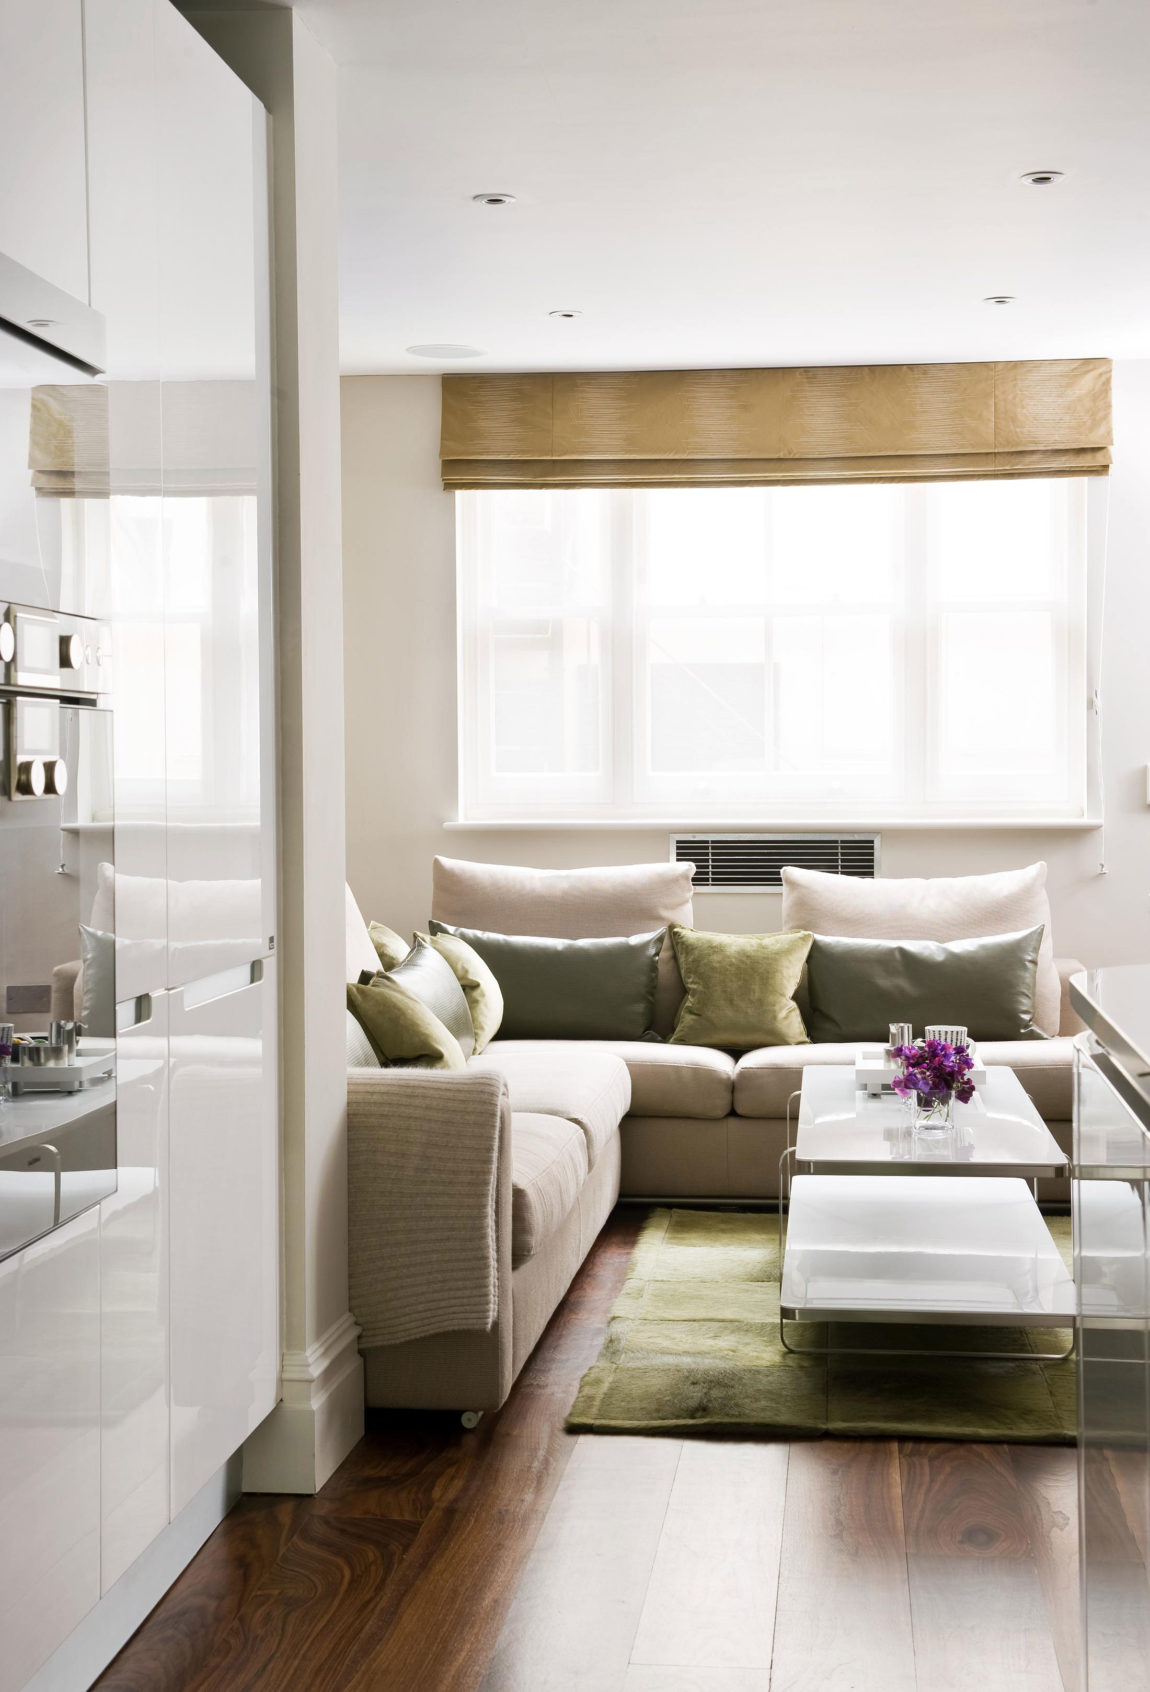 Belgravia House by Staffan Tollgard Design Group (6)